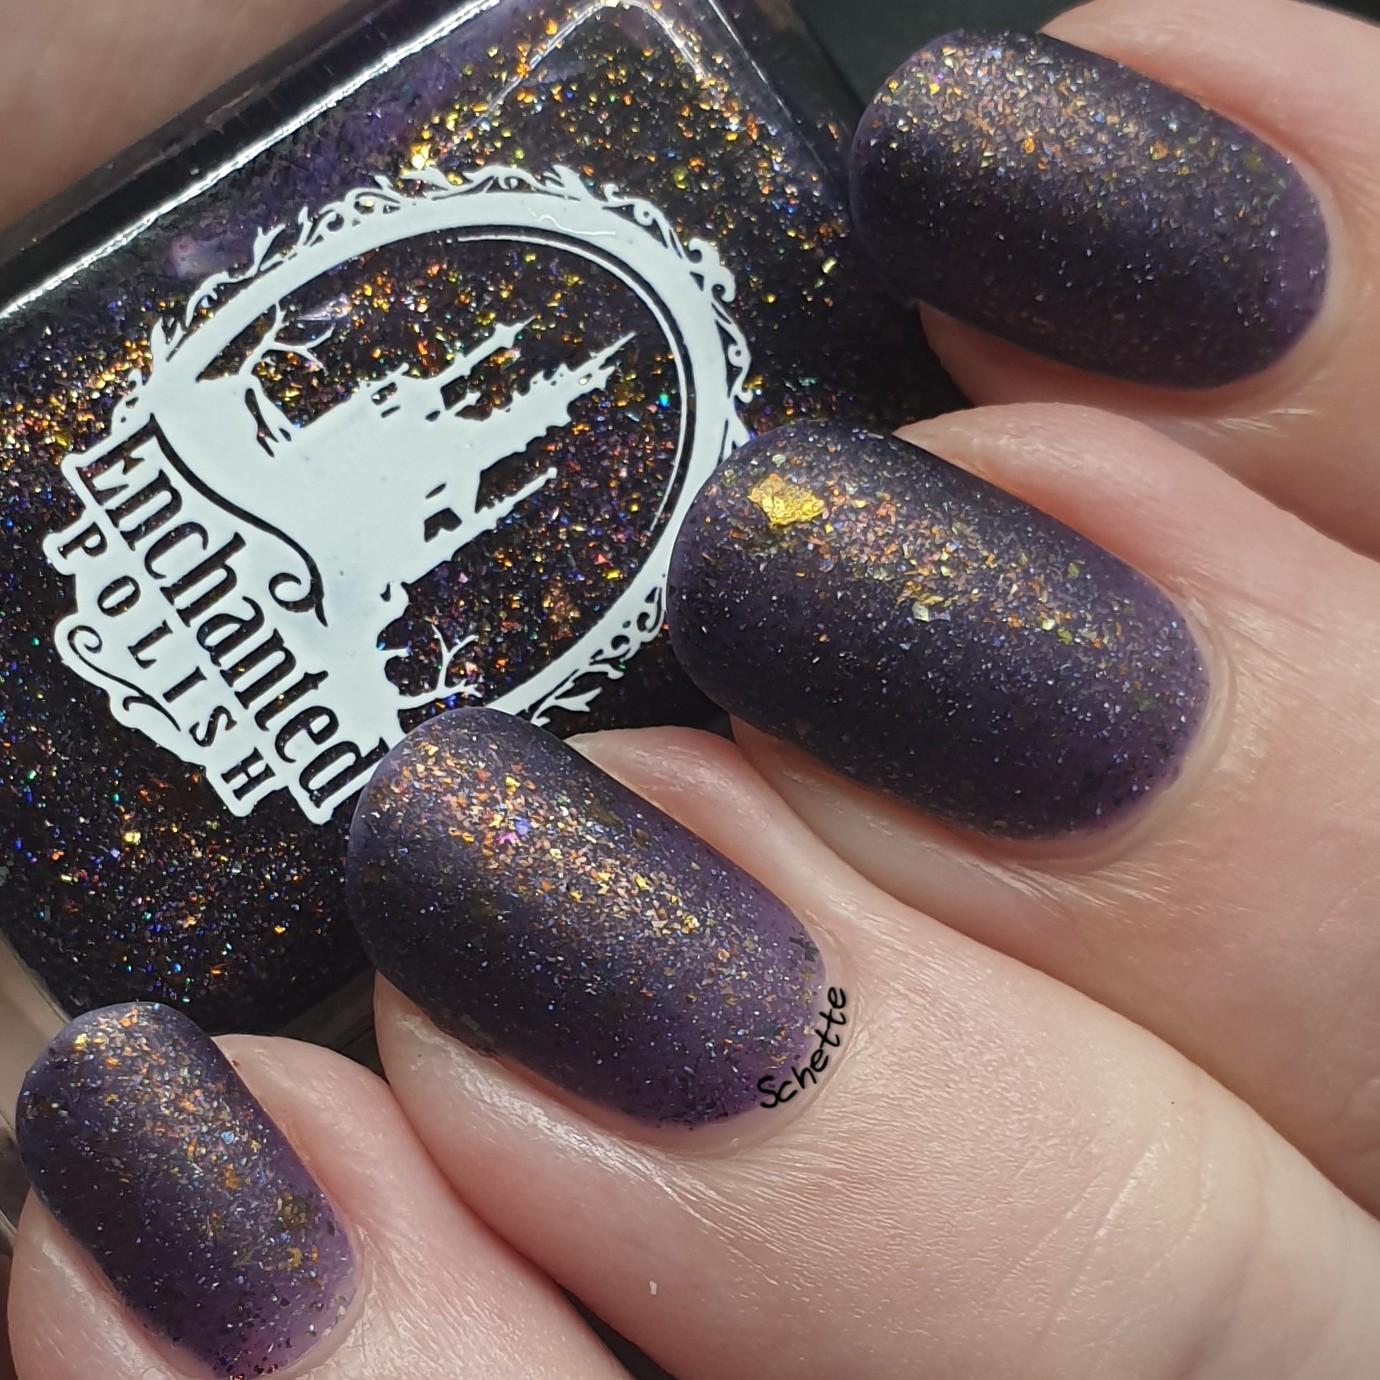 Enchanted Polish - Cosmic Dust